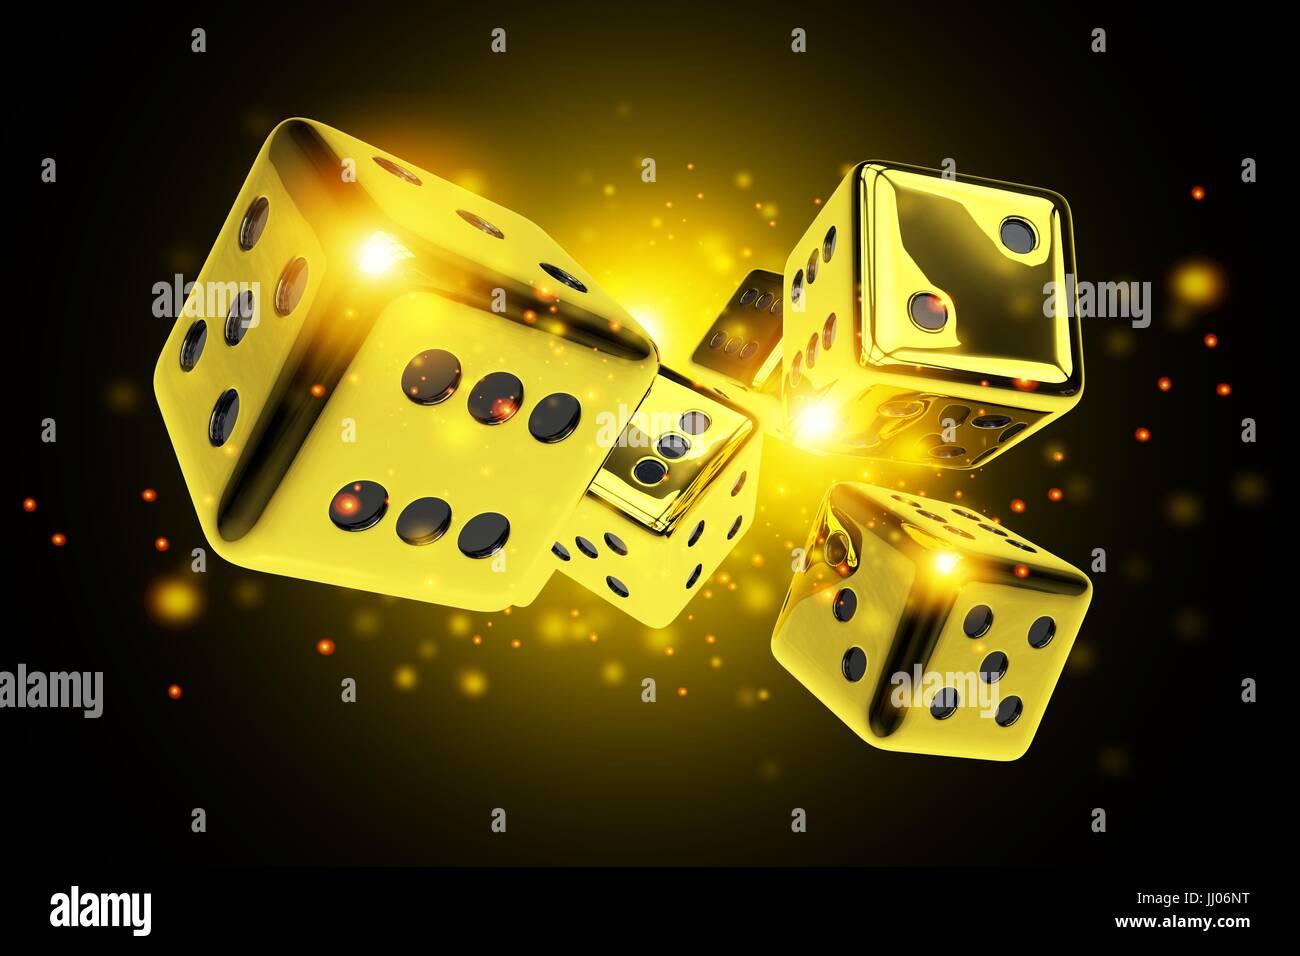 Golden Dice Casino Game 3d Rendered Concept Illustration Vegas Stock Photo Alamy